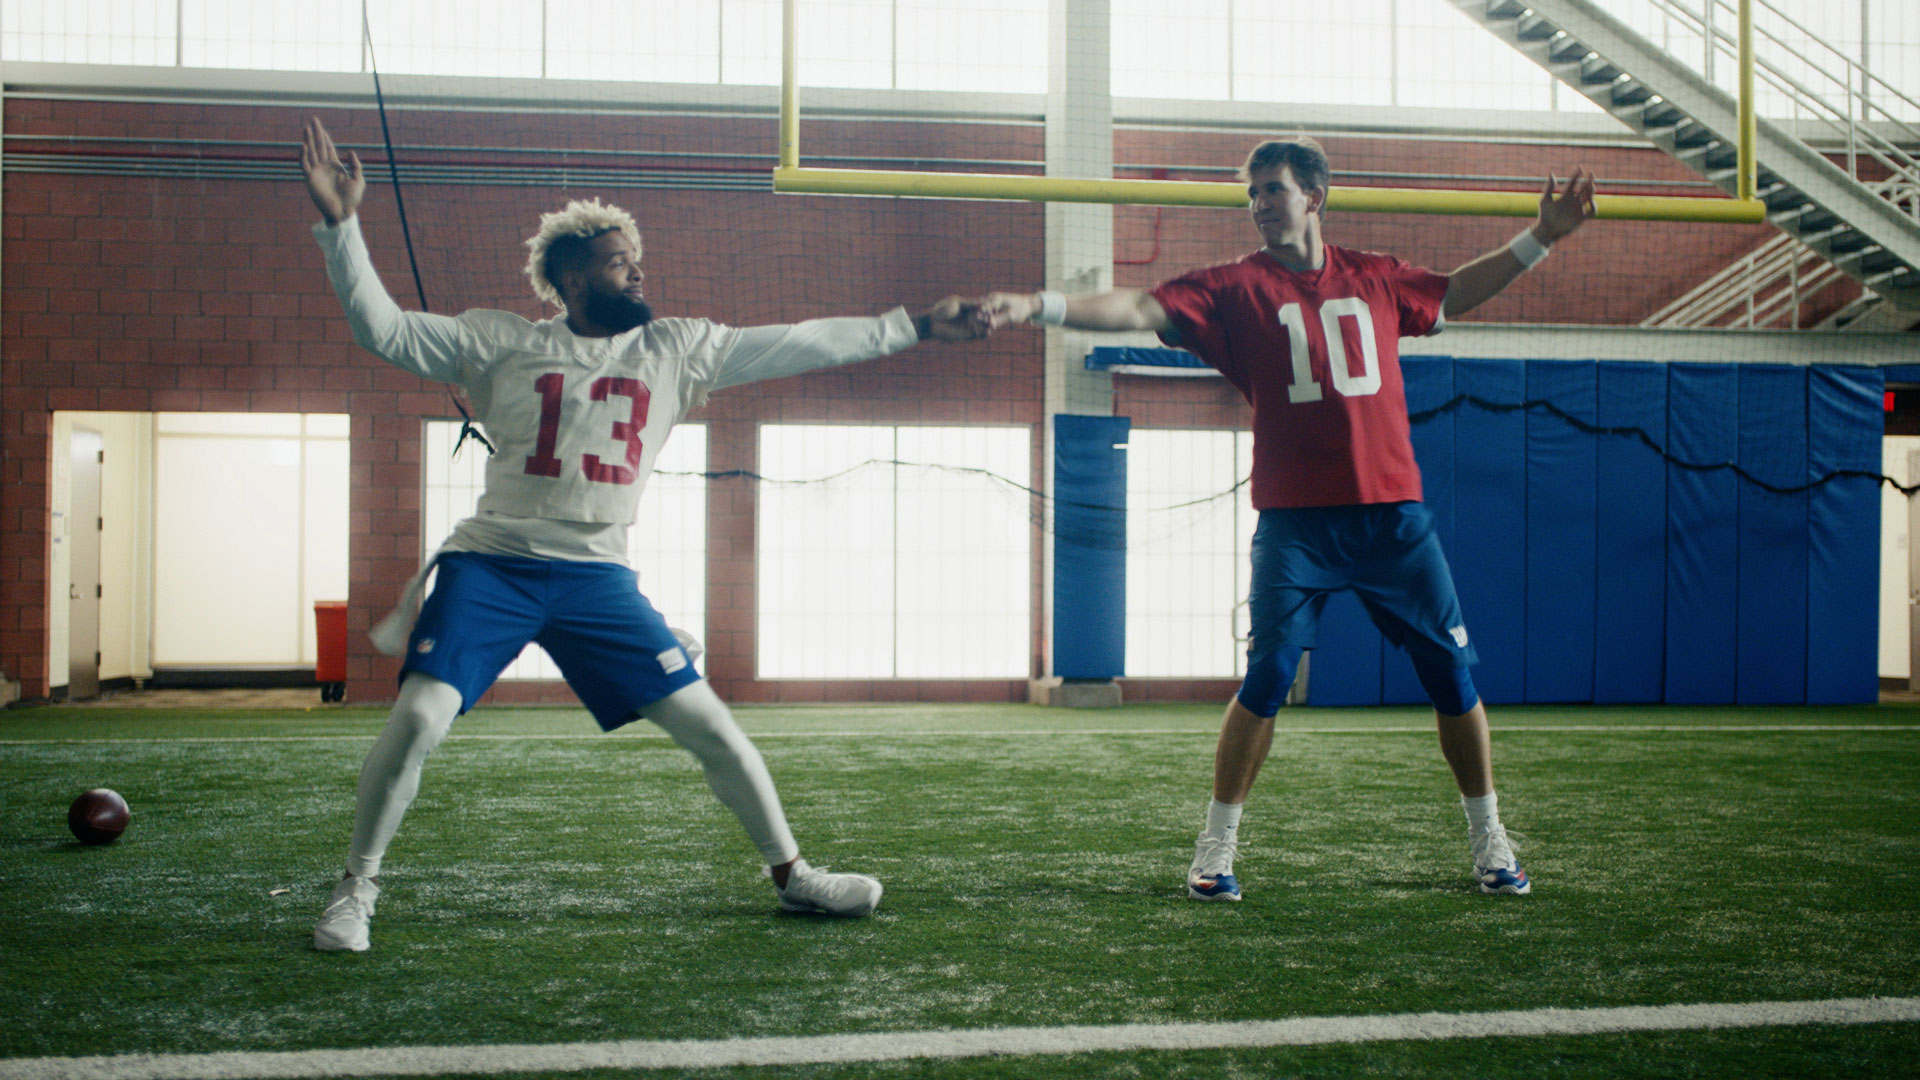 NFL<br />TD Celebrations to Come (2018)